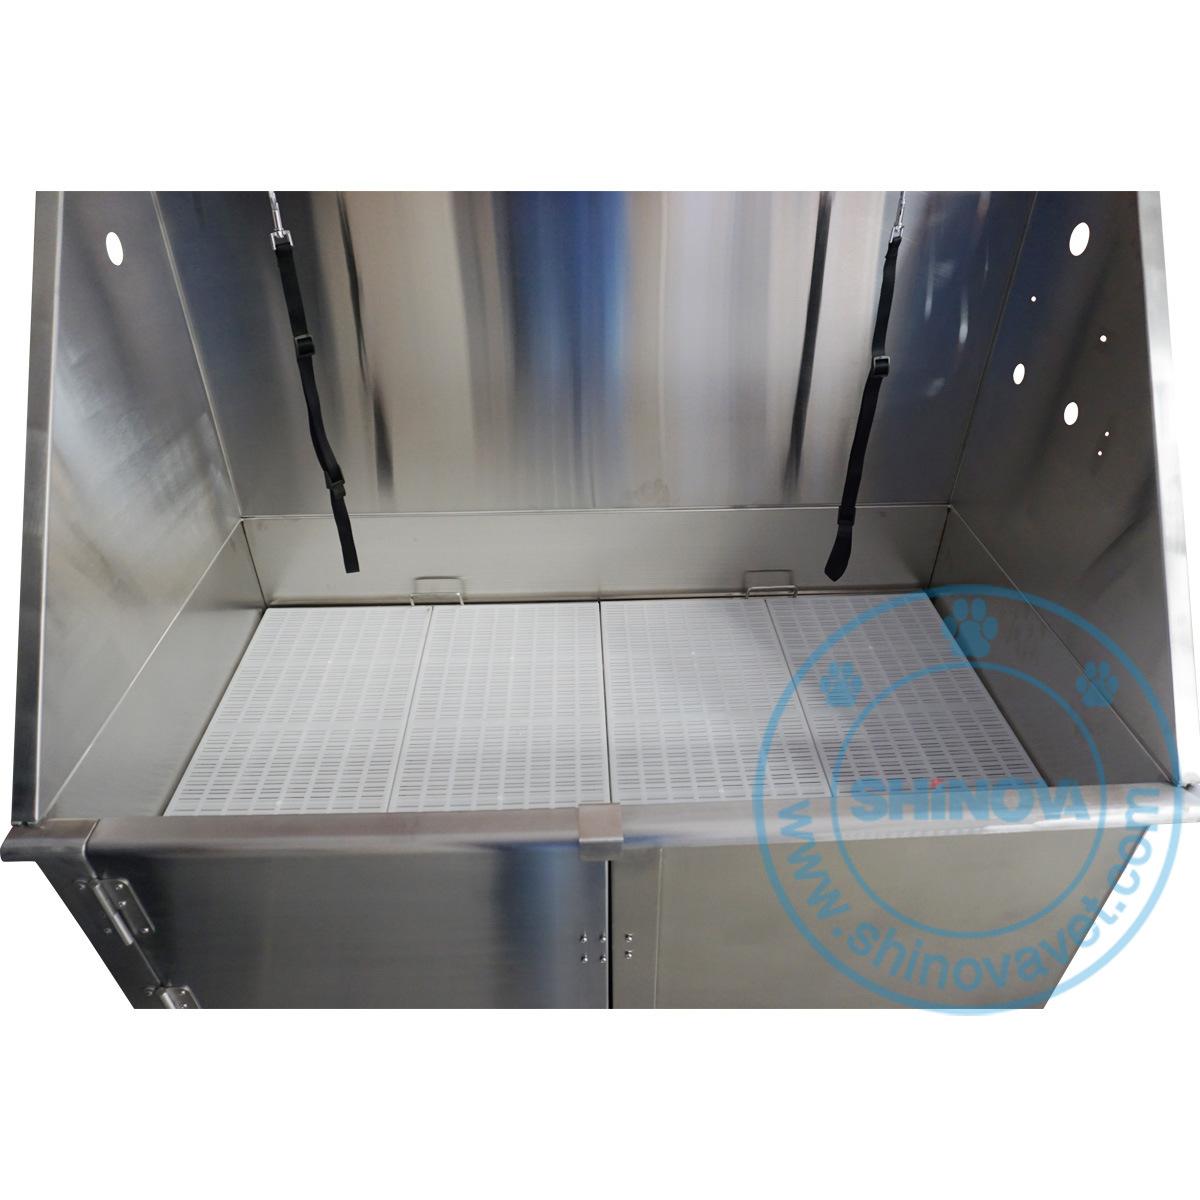 Stainless Steel Grooming Tub (PT-1S)